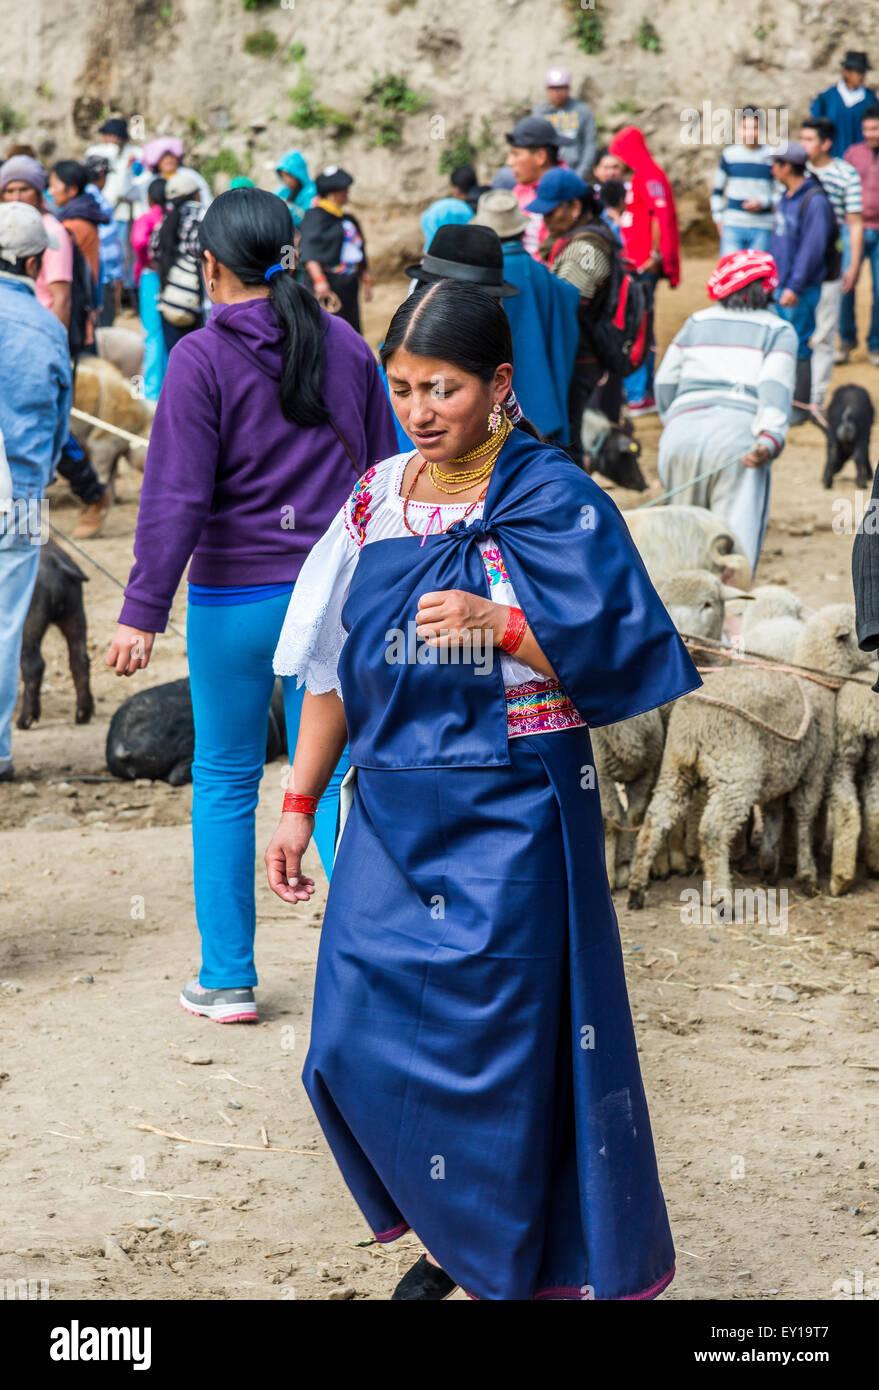 A native woman in traditional dress at livestock market. Otavalo, Ecuador. - Stock Image